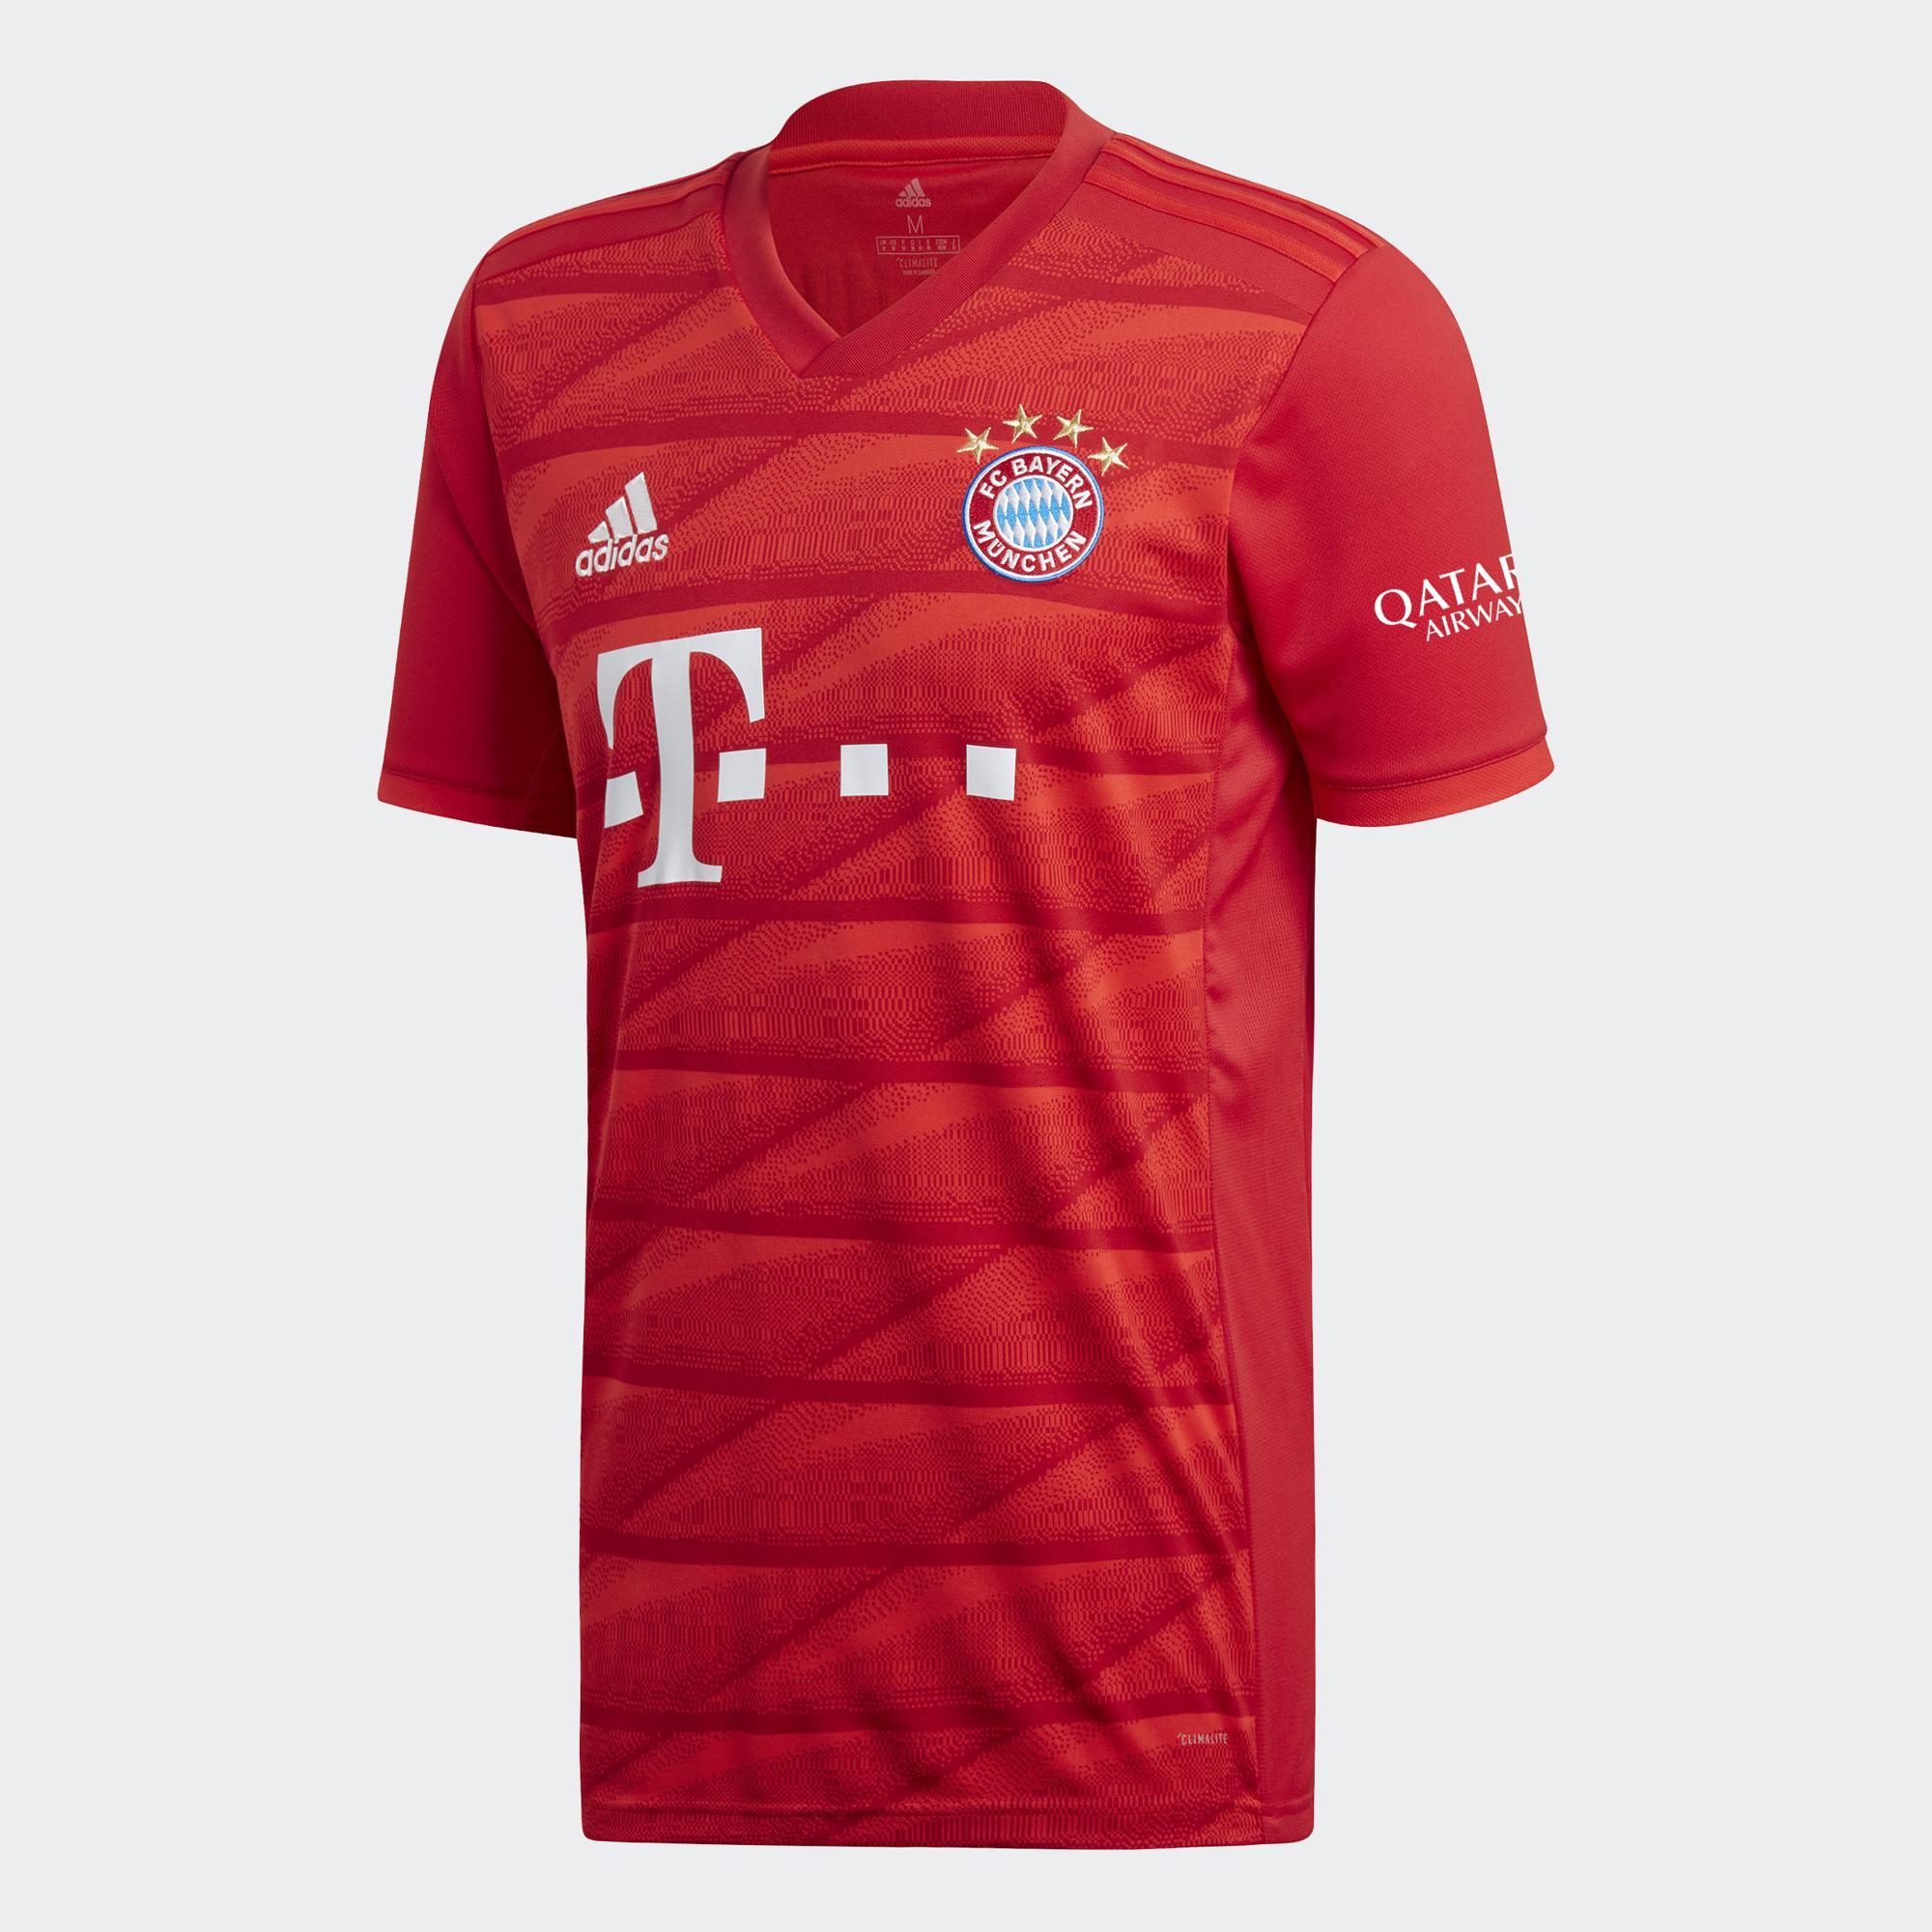 Adidas Maglia Gara Home Bayern Monaco   19/20